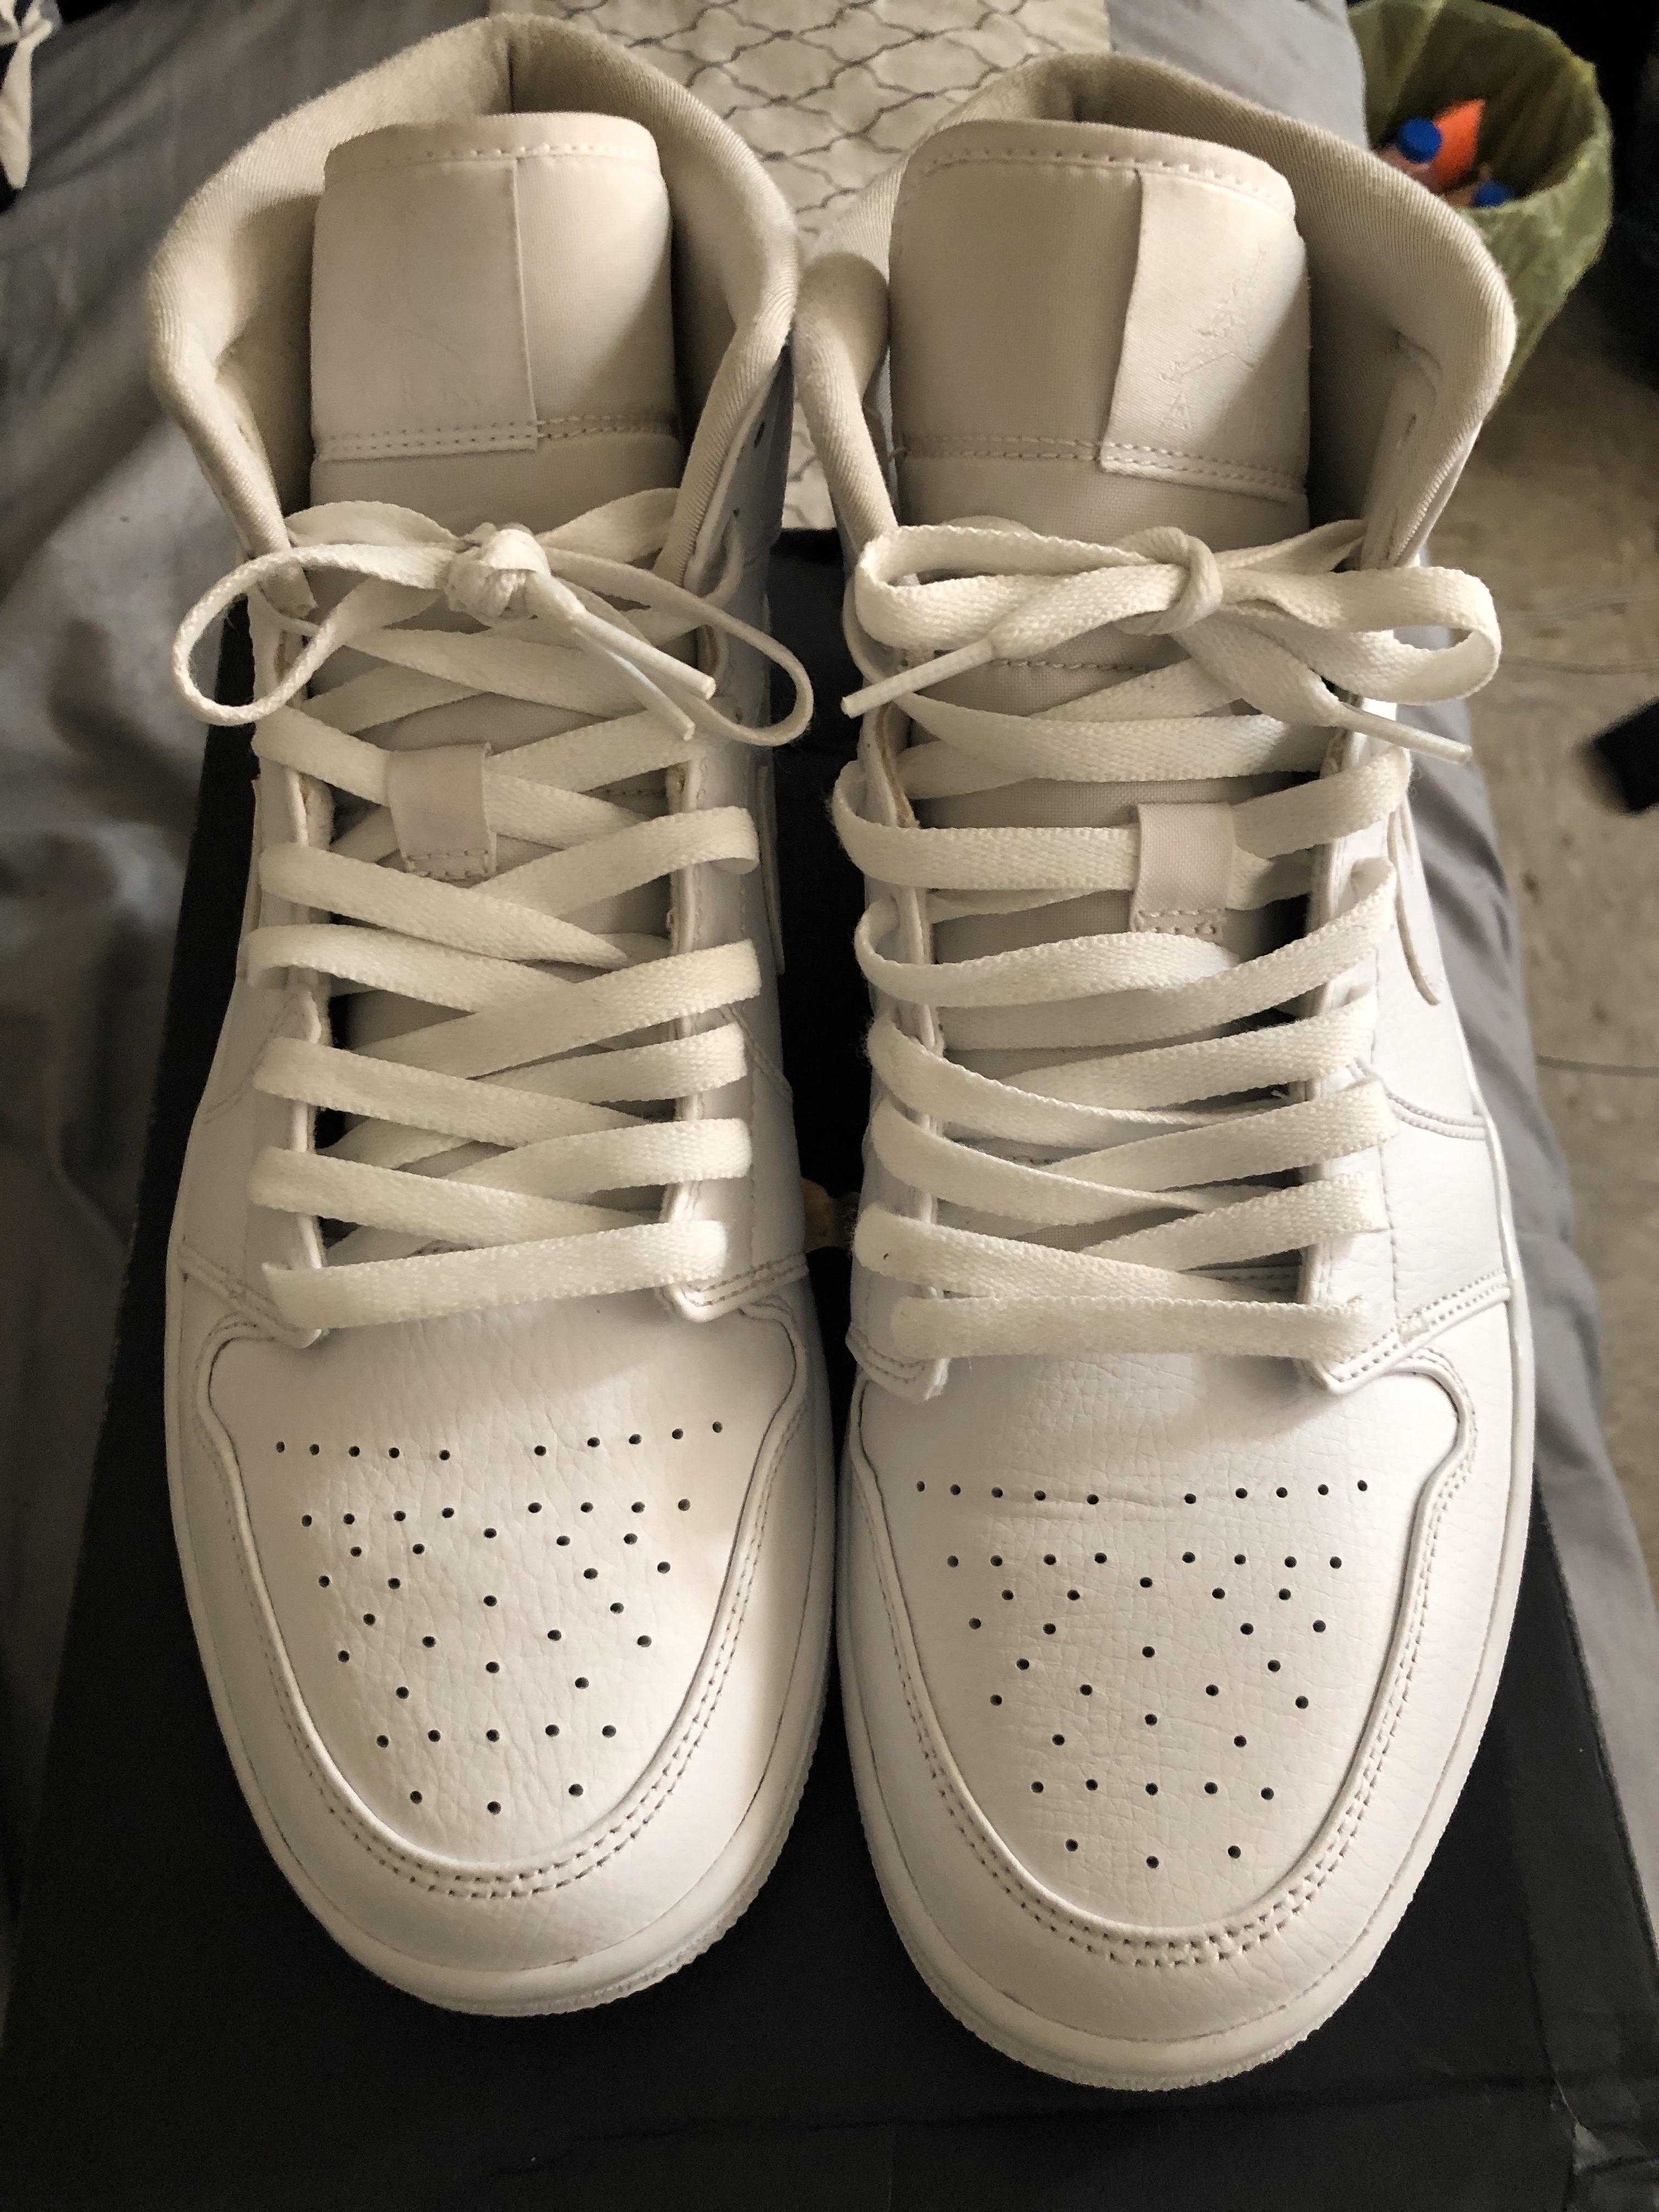 Air Jordan - $100 - Size 10